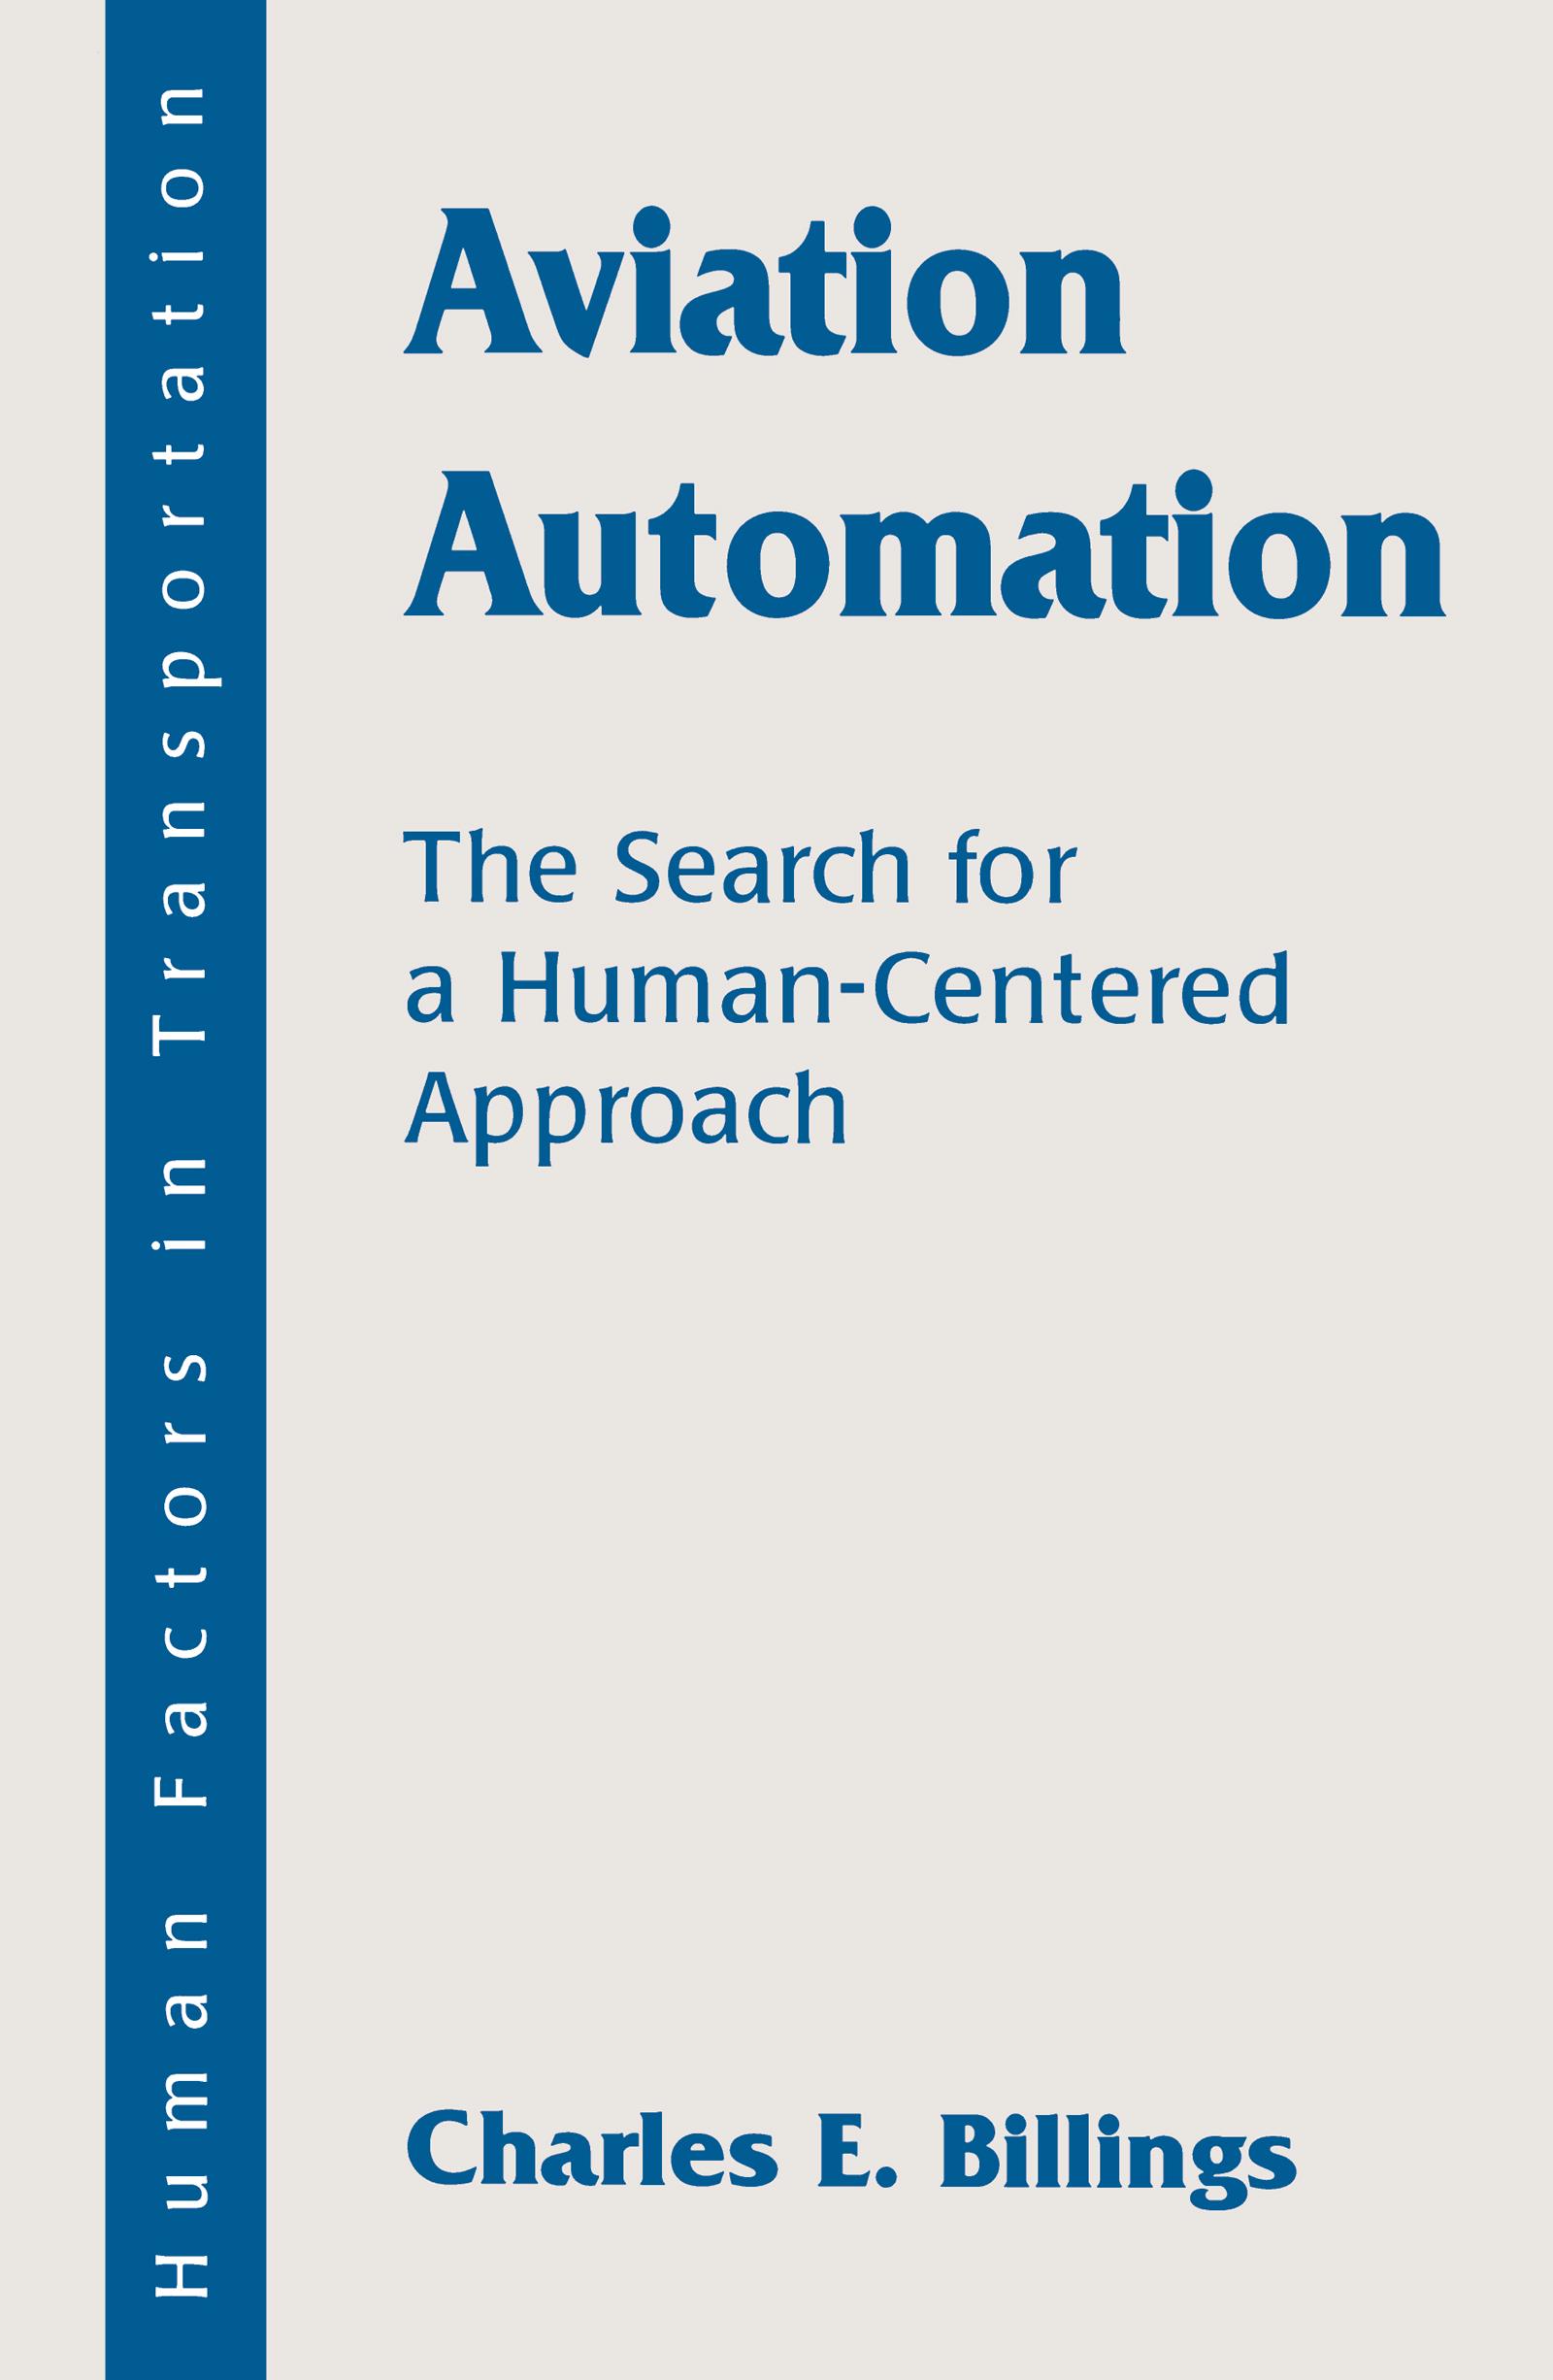 Aviation Automation